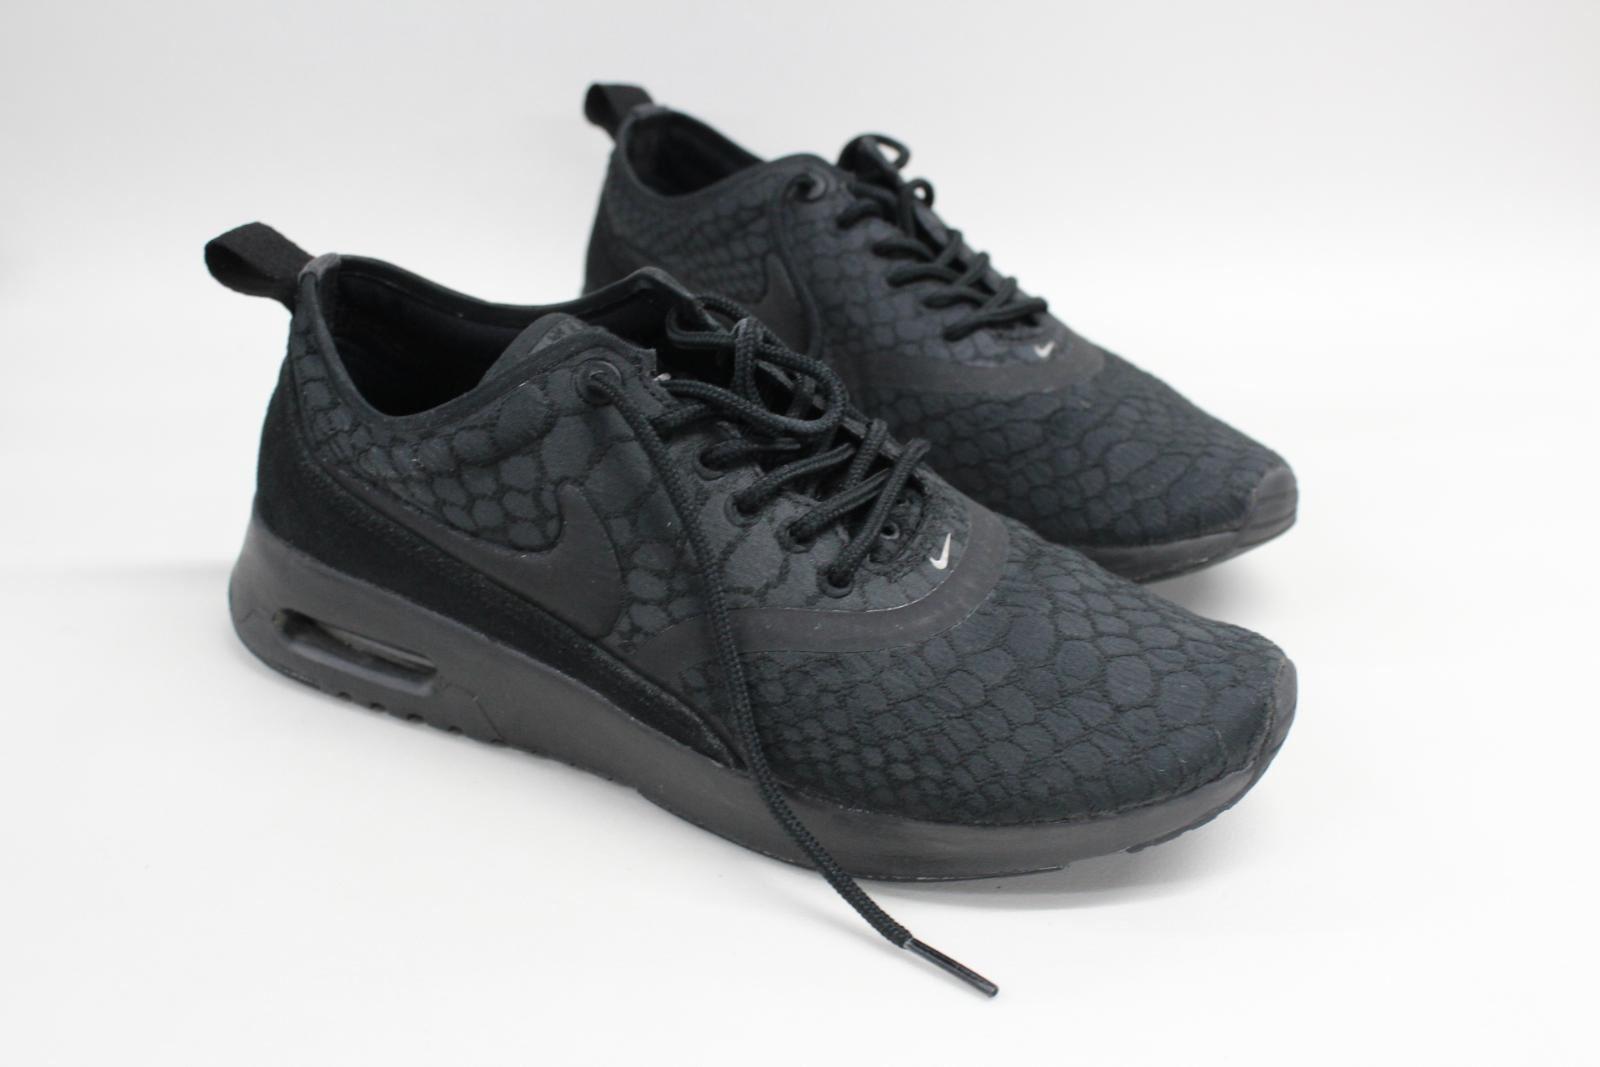 Nike-Air-Max-Thea-Ultra-Femmes-Baskets-noir-sportswear-Taille-UK4-5-EU38